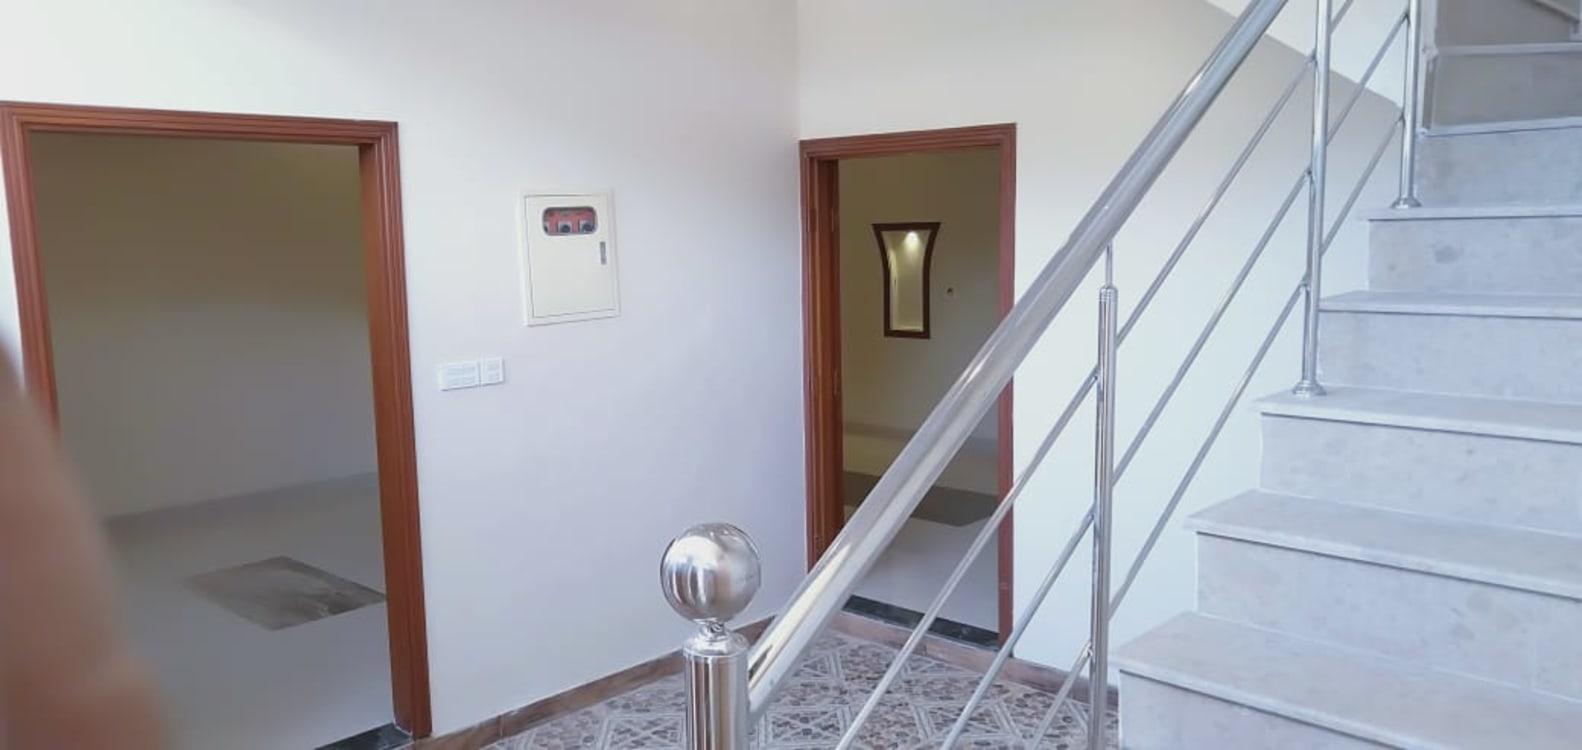 132 Sqyd  House for Sale   Graana.com